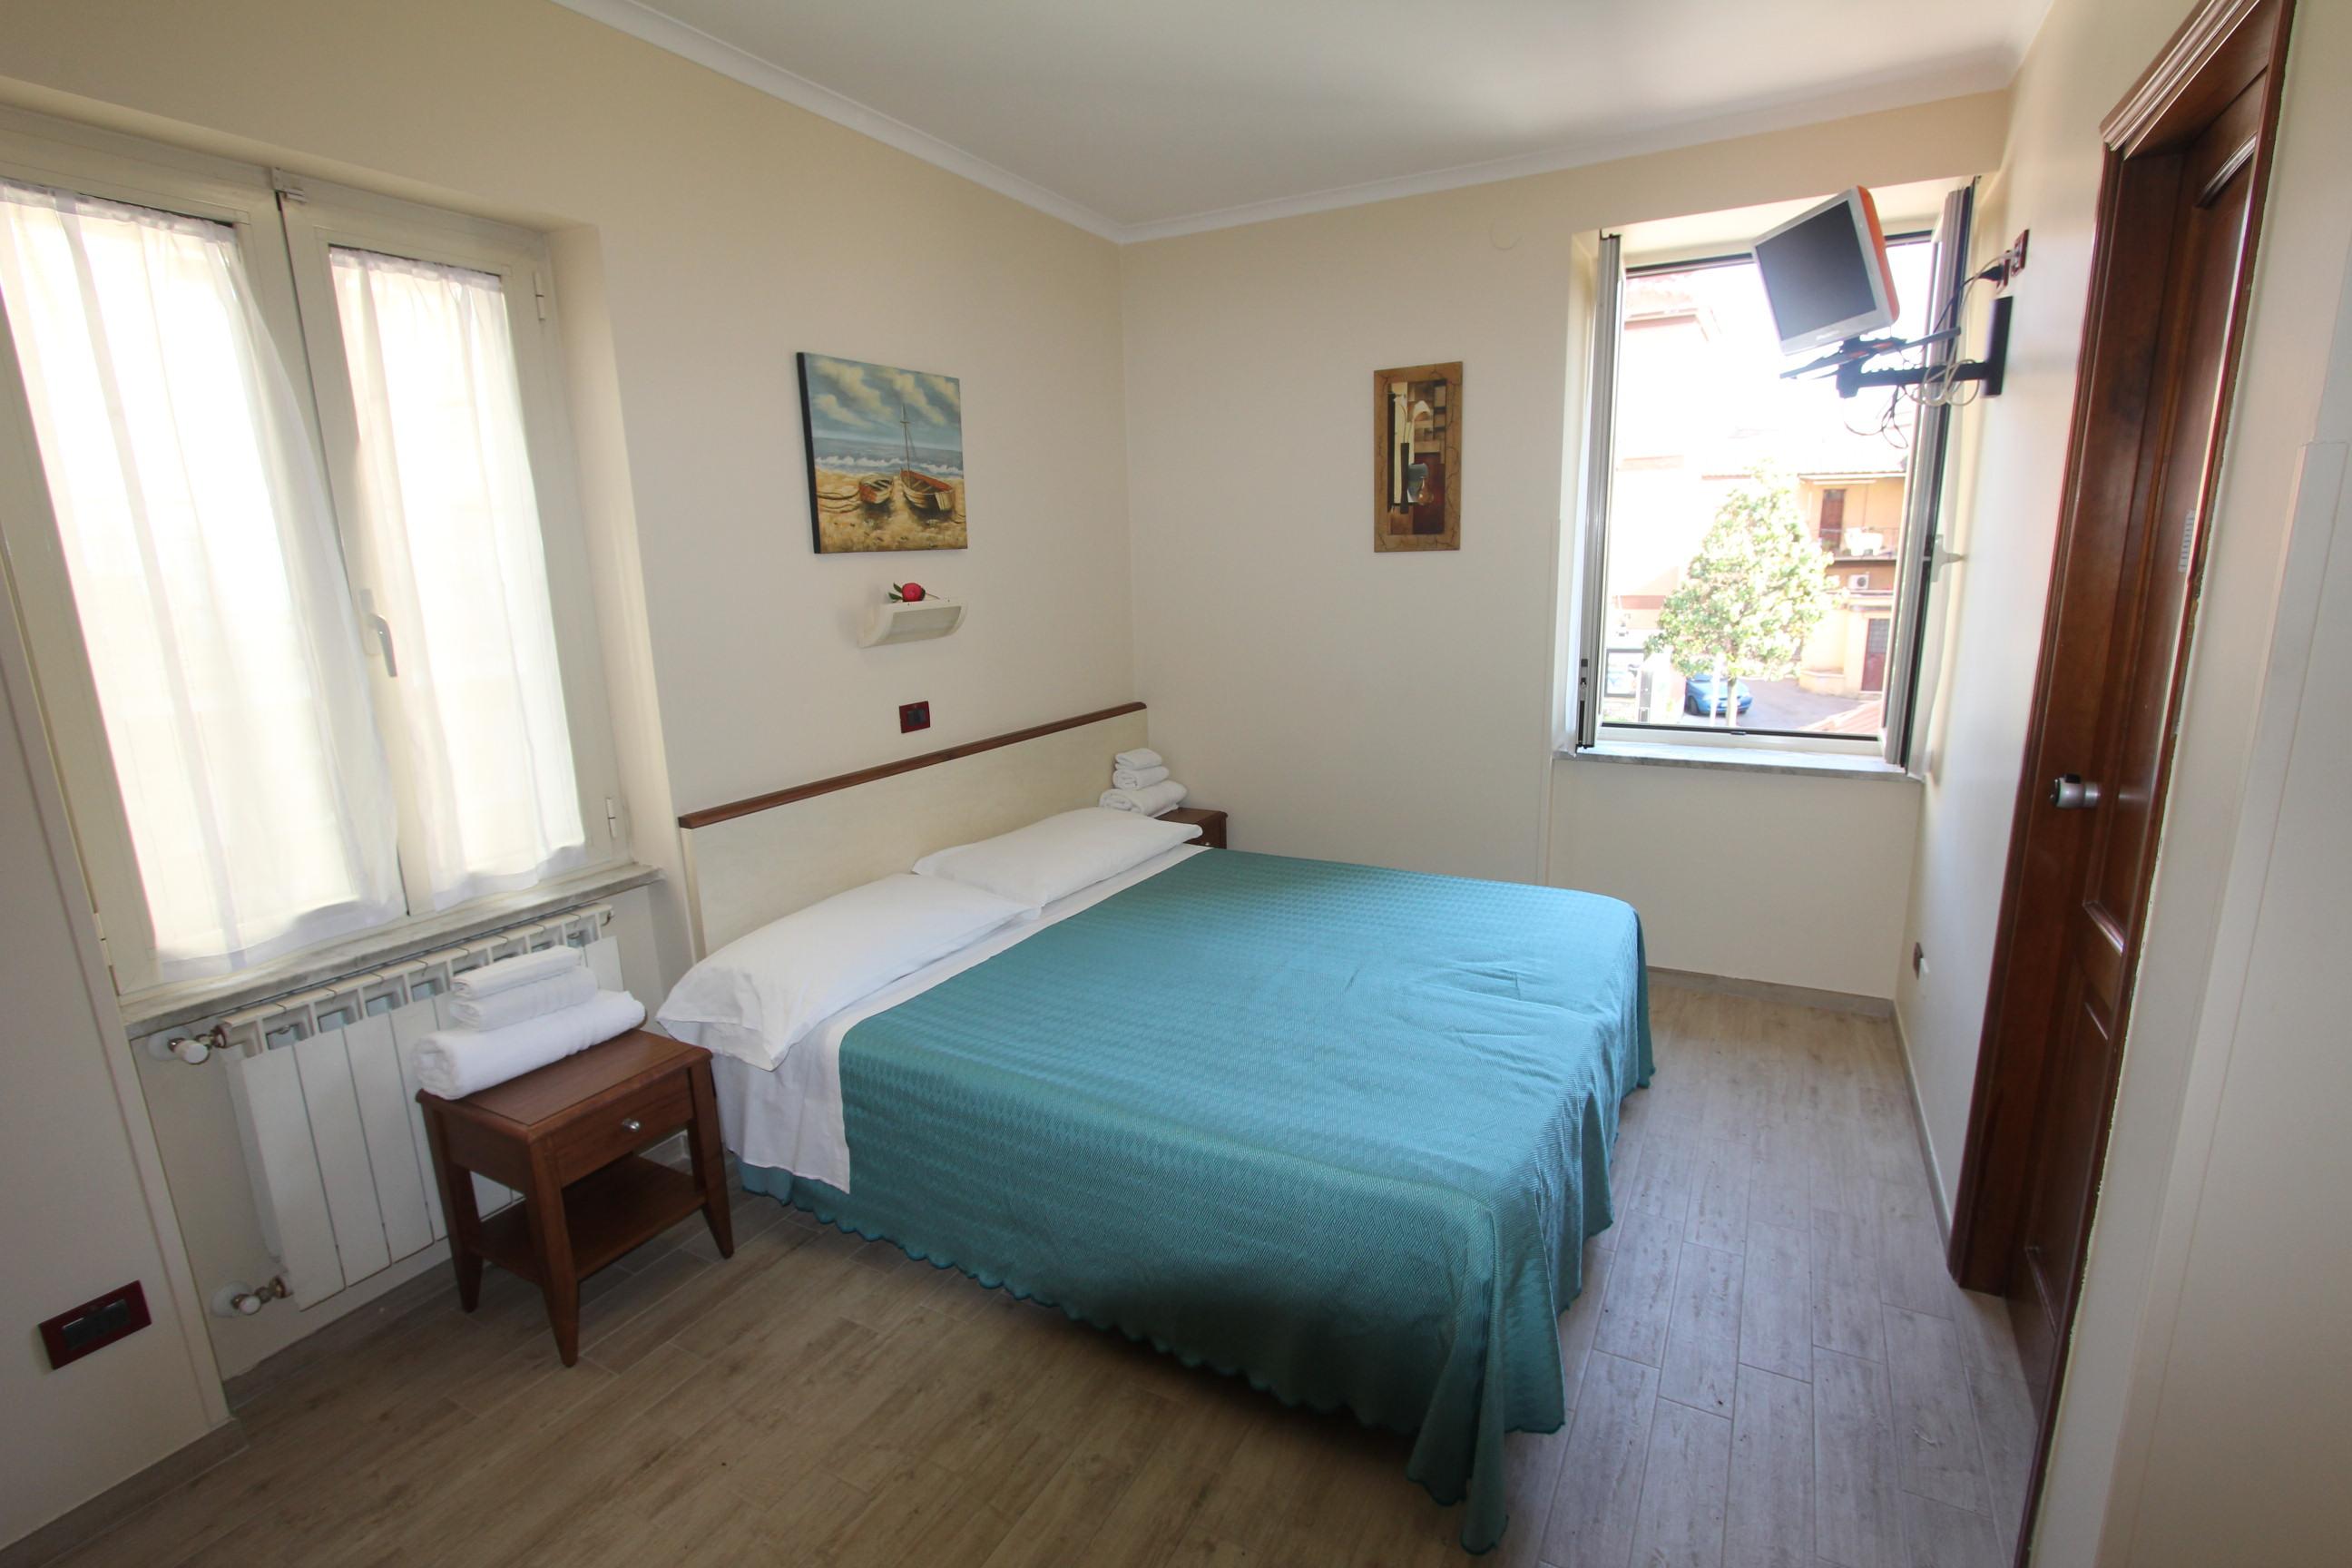 Camera quadrupla roma for Camera roma